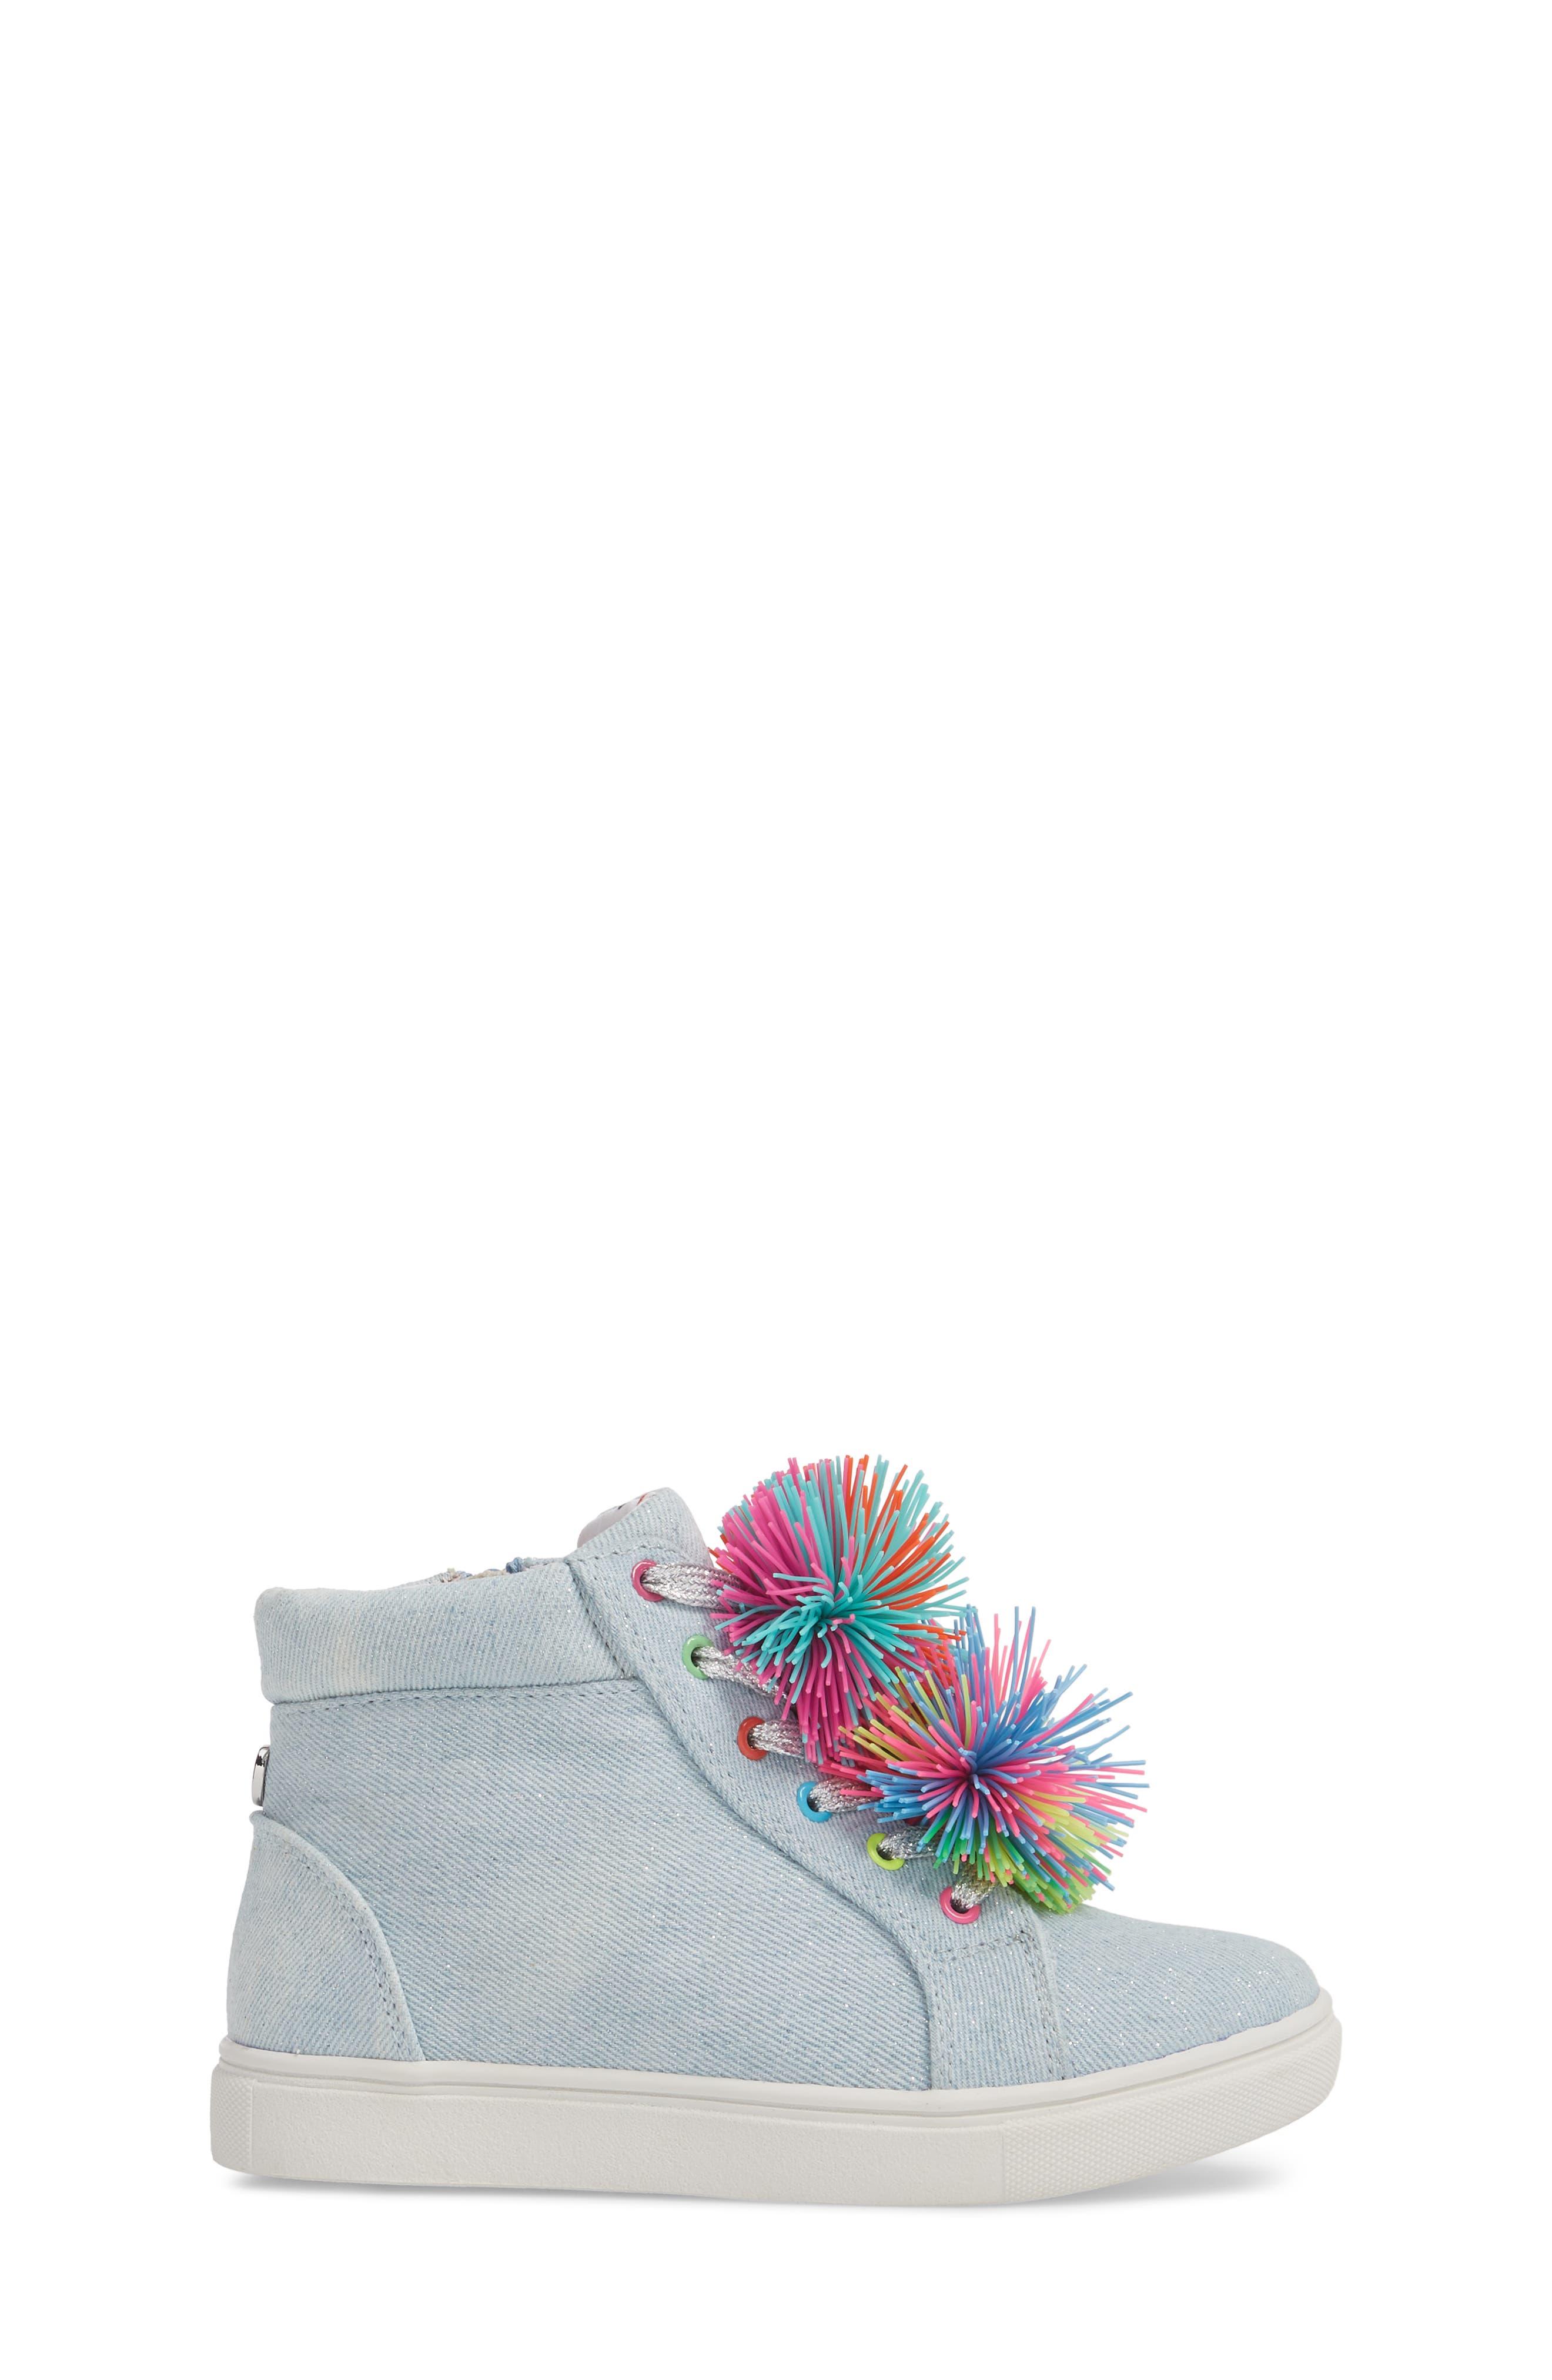 JBrendie Pompom High Top Sneaker,                             Alternate thumbnail 3, color,                             Denim